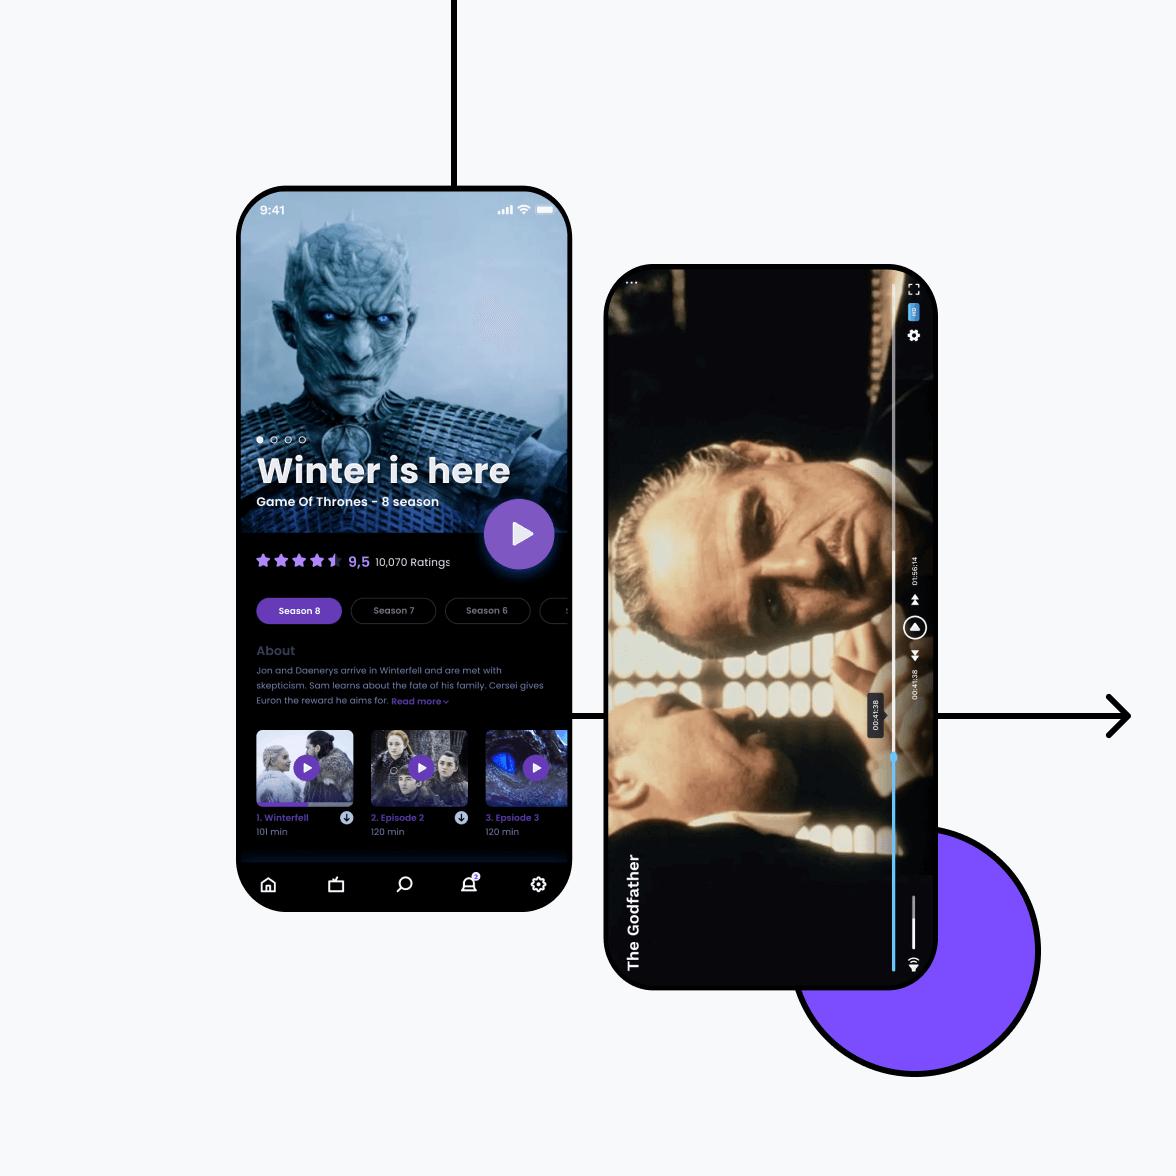 OTT App screens